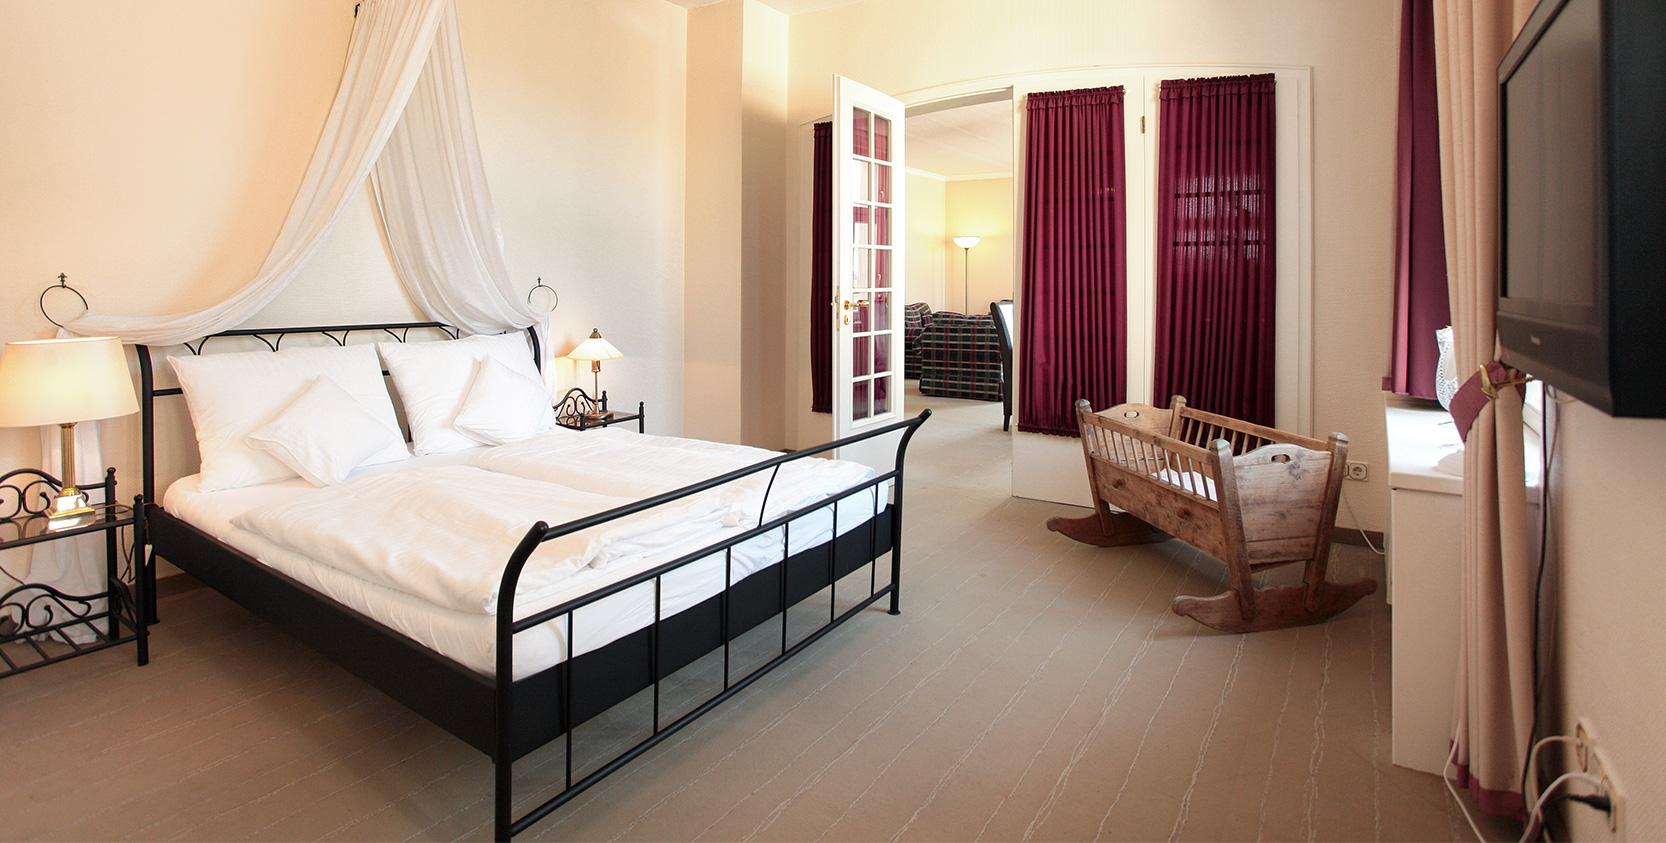 Unsere zimmer hotel haus duden wesel for Zimmer hotel